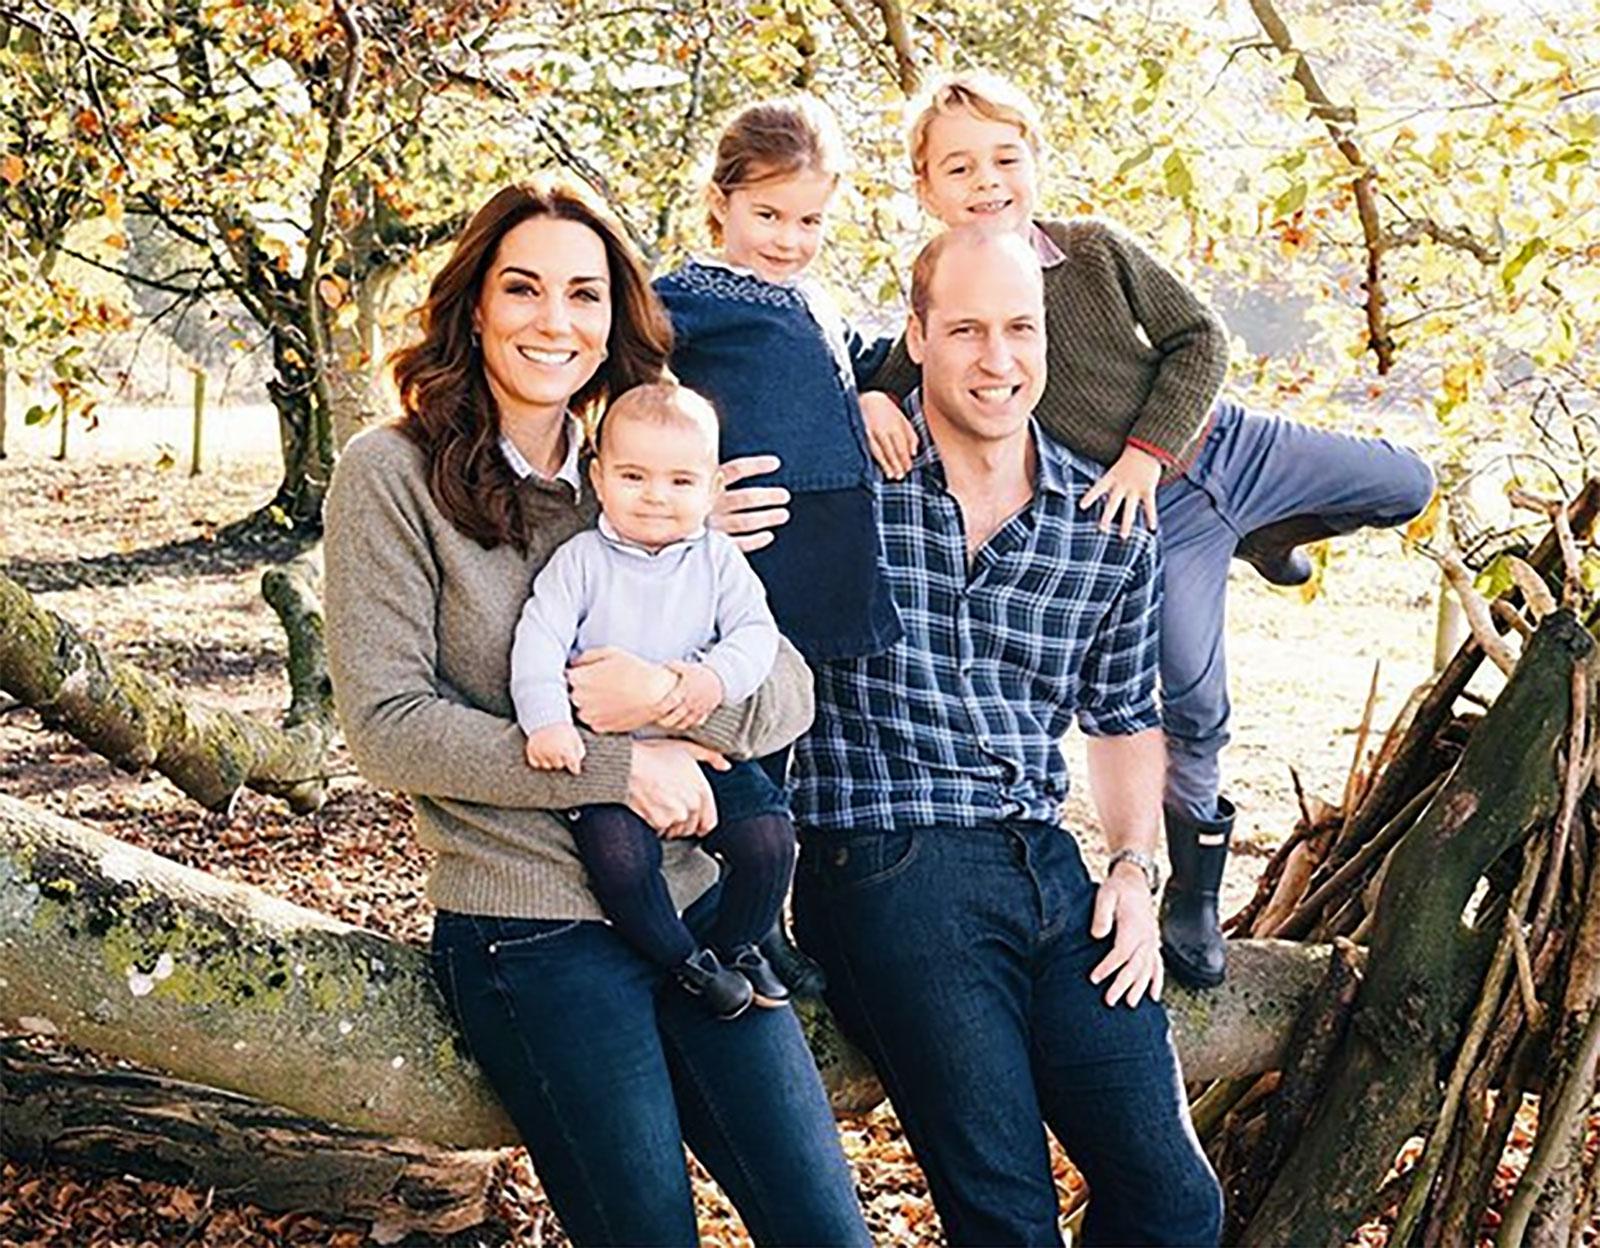 Príncipe William, Kate Middleton